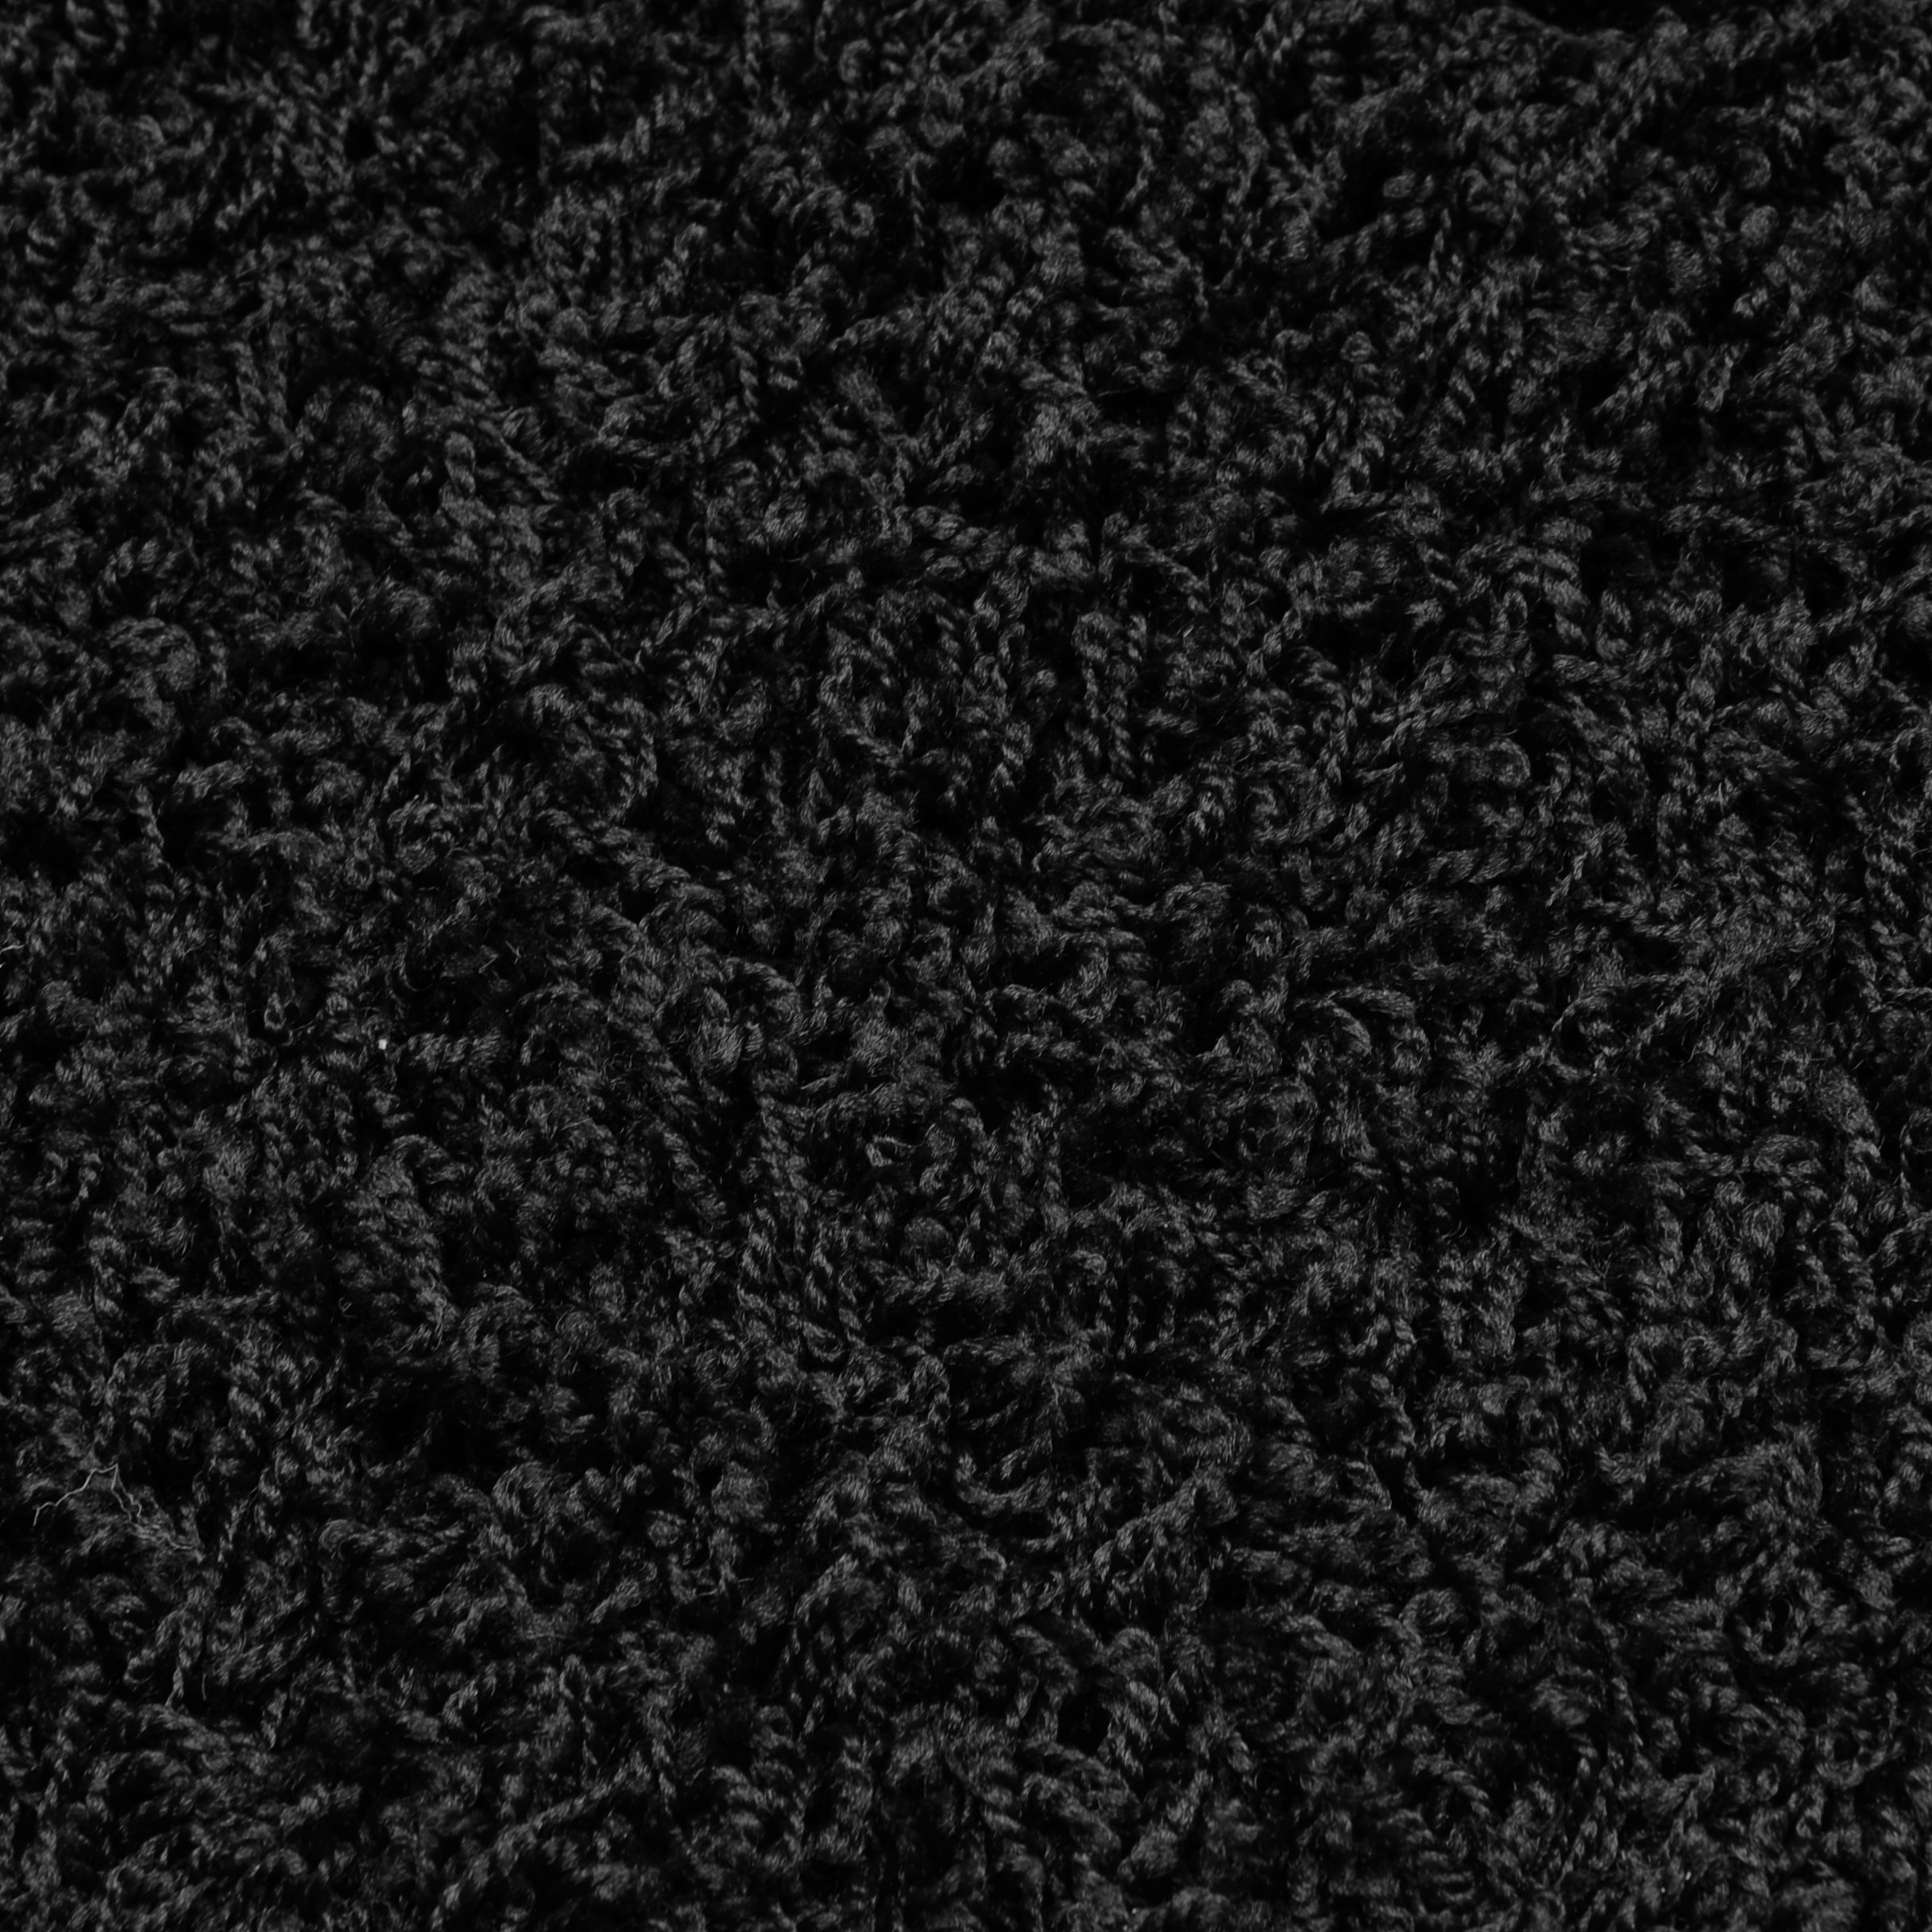 Garland Rug Southpointe Shag Area Rug, 3-Feet by 5-Feet, Black by Garland Rug (Image #2)